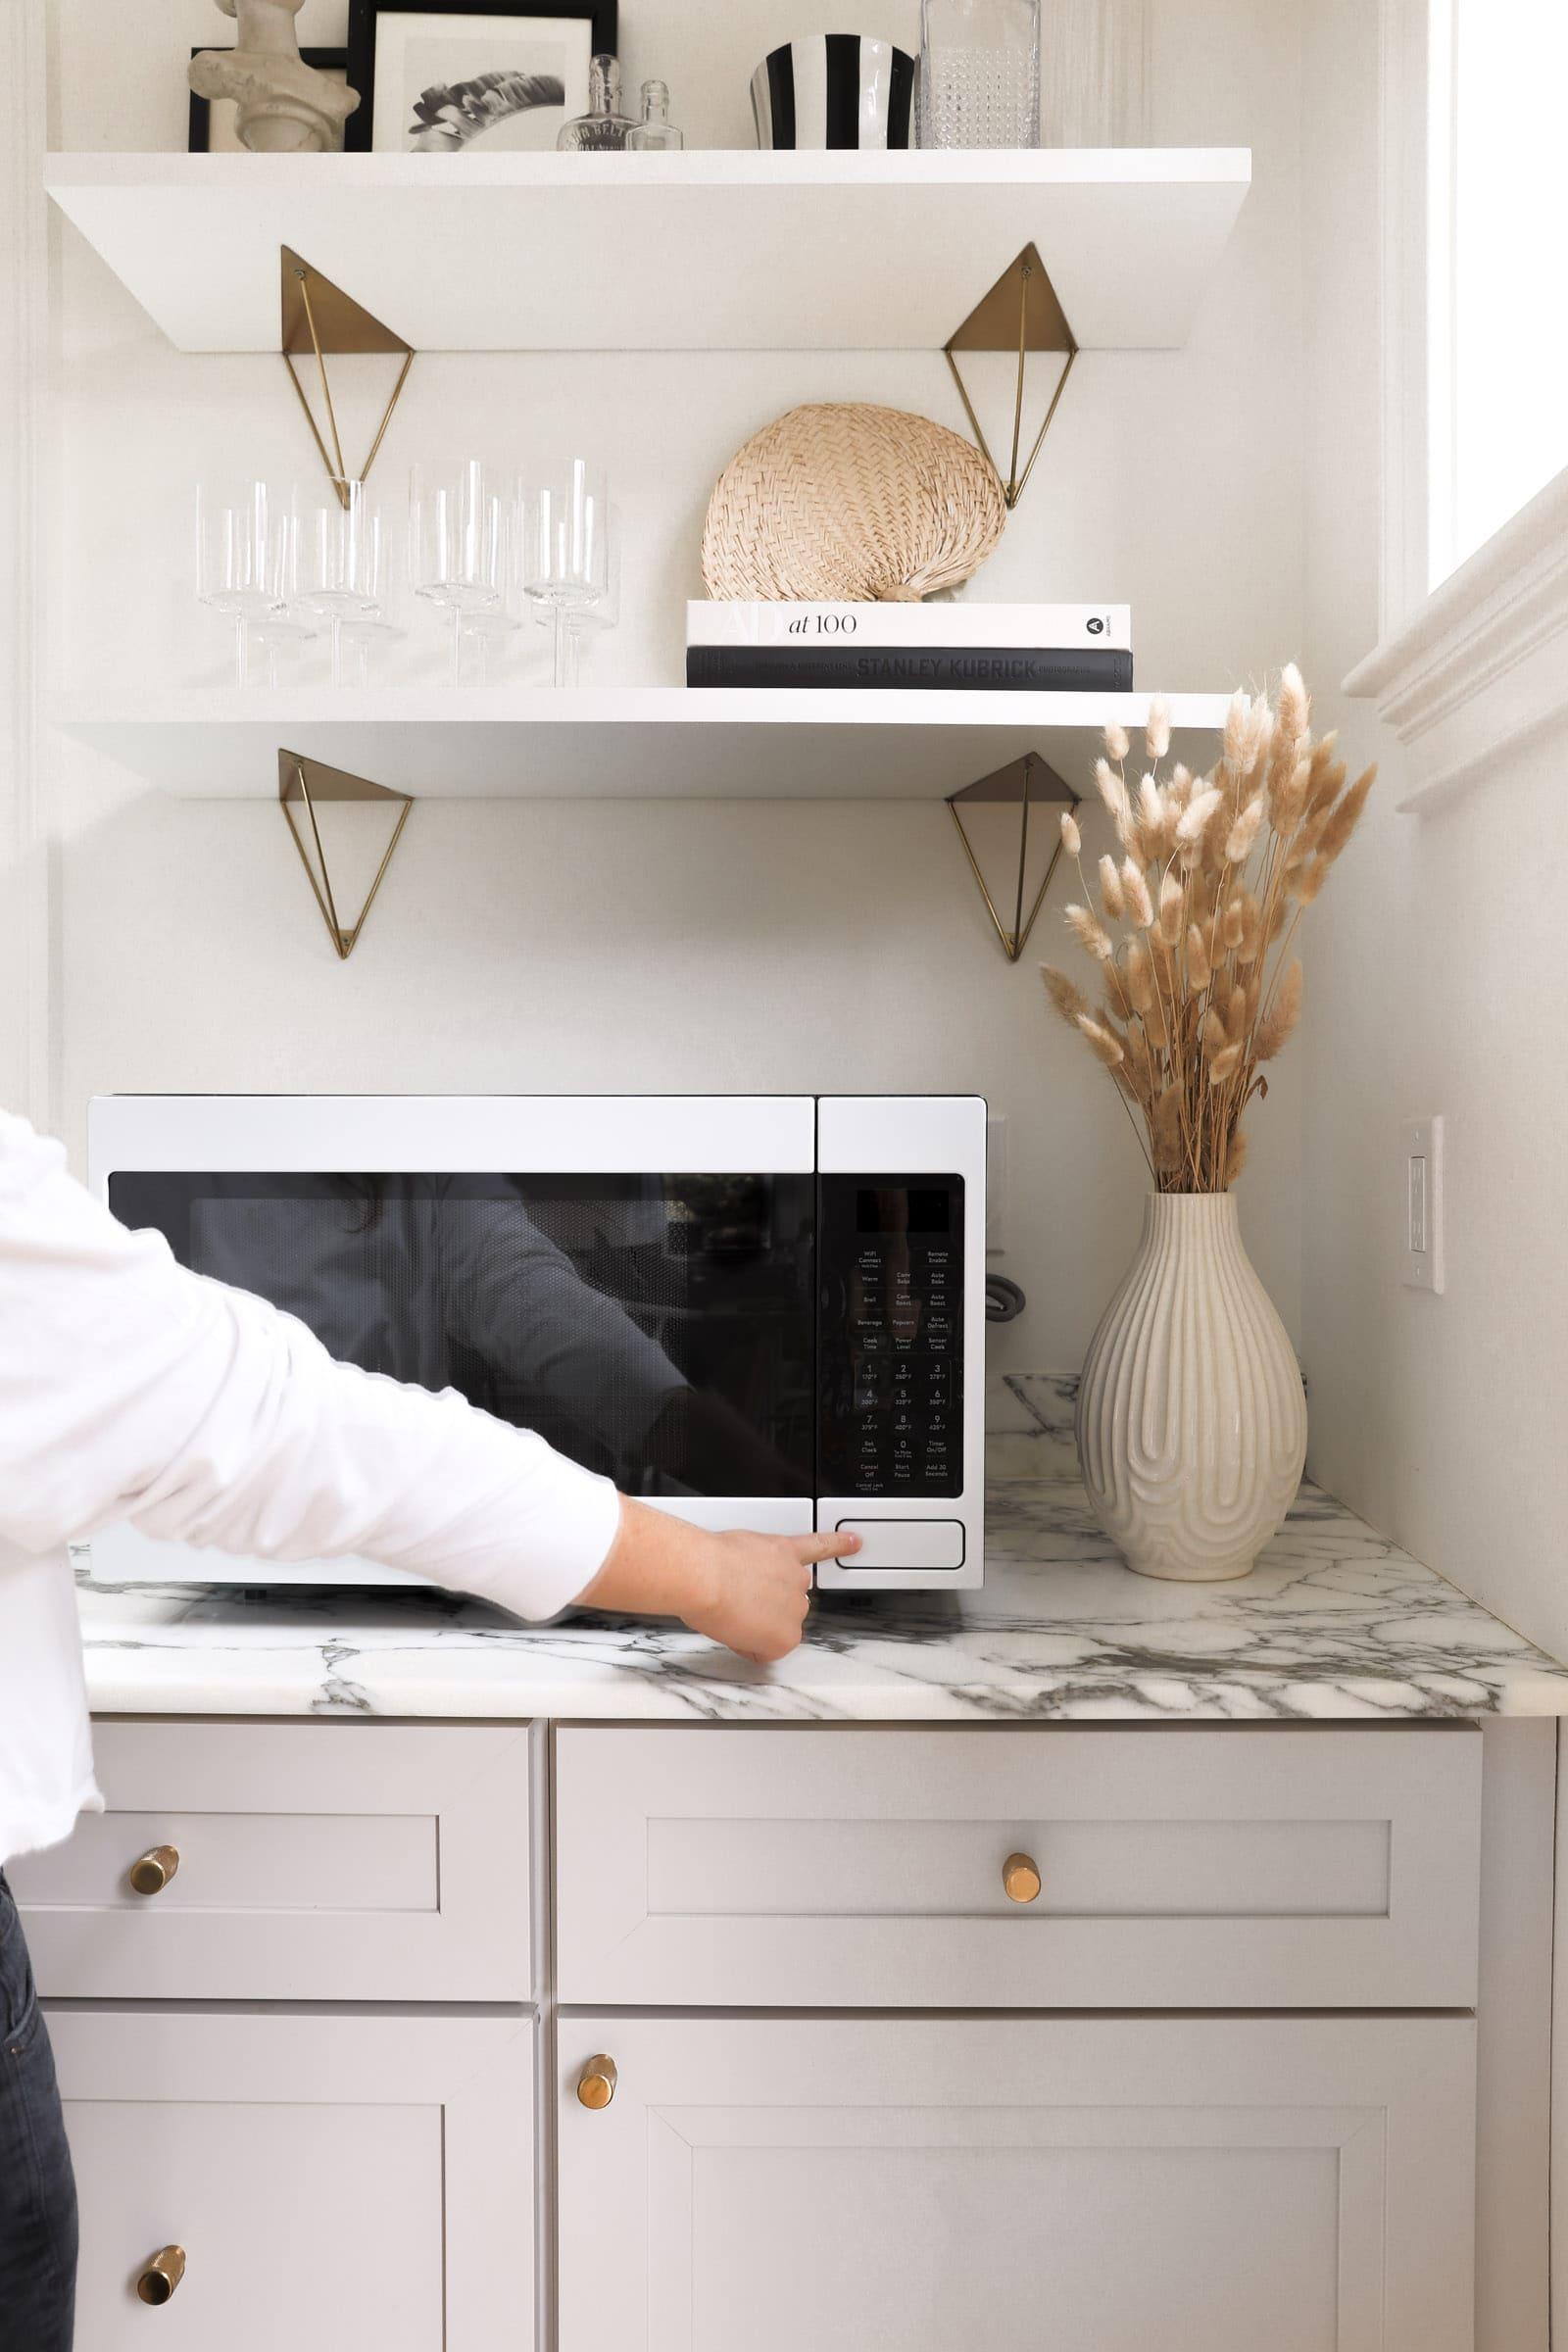 cafe appliances microwave